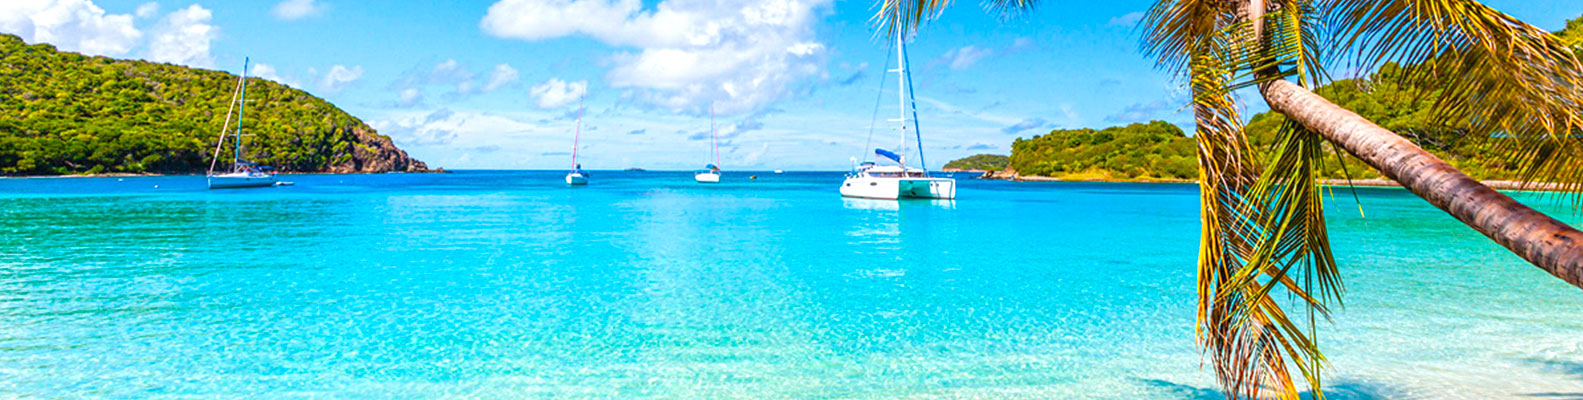 Sailing in The Caribbean, British Virgin Islands